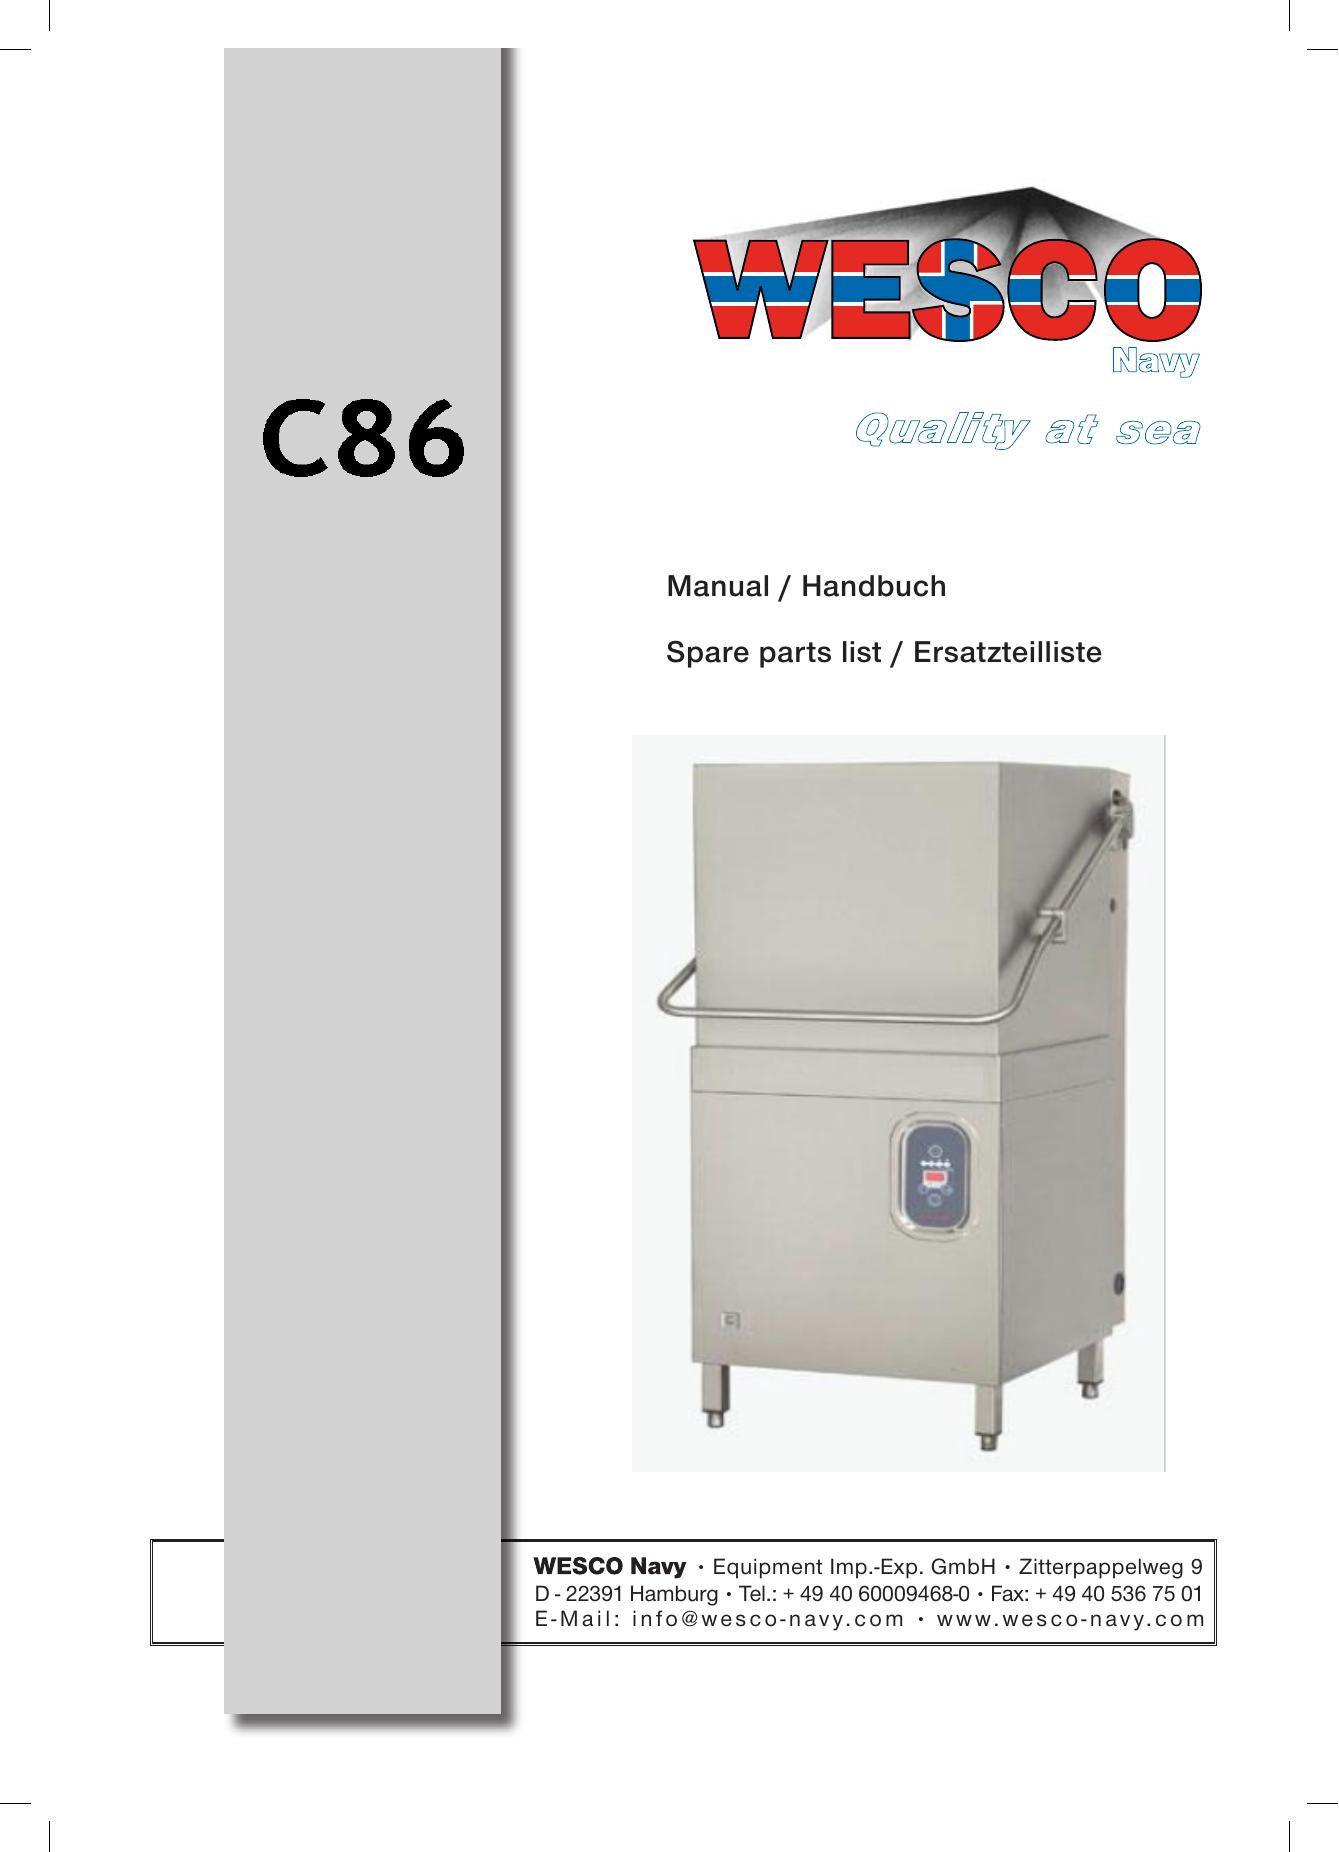 C86 - WESCO-Navy | manualzz.com Wesco Thermostat Wiring Diagram on